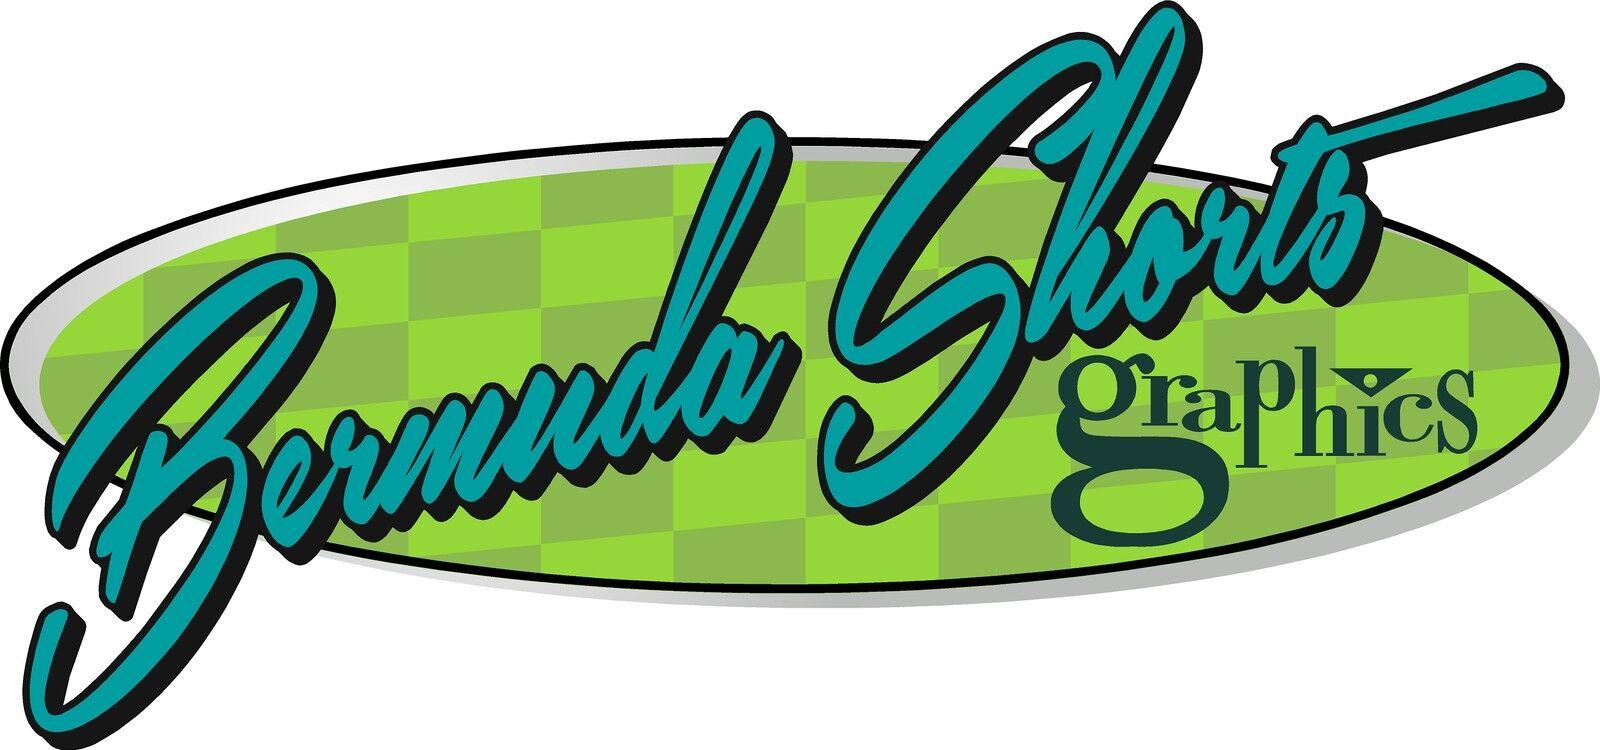 Bermuda Shorts Graphics